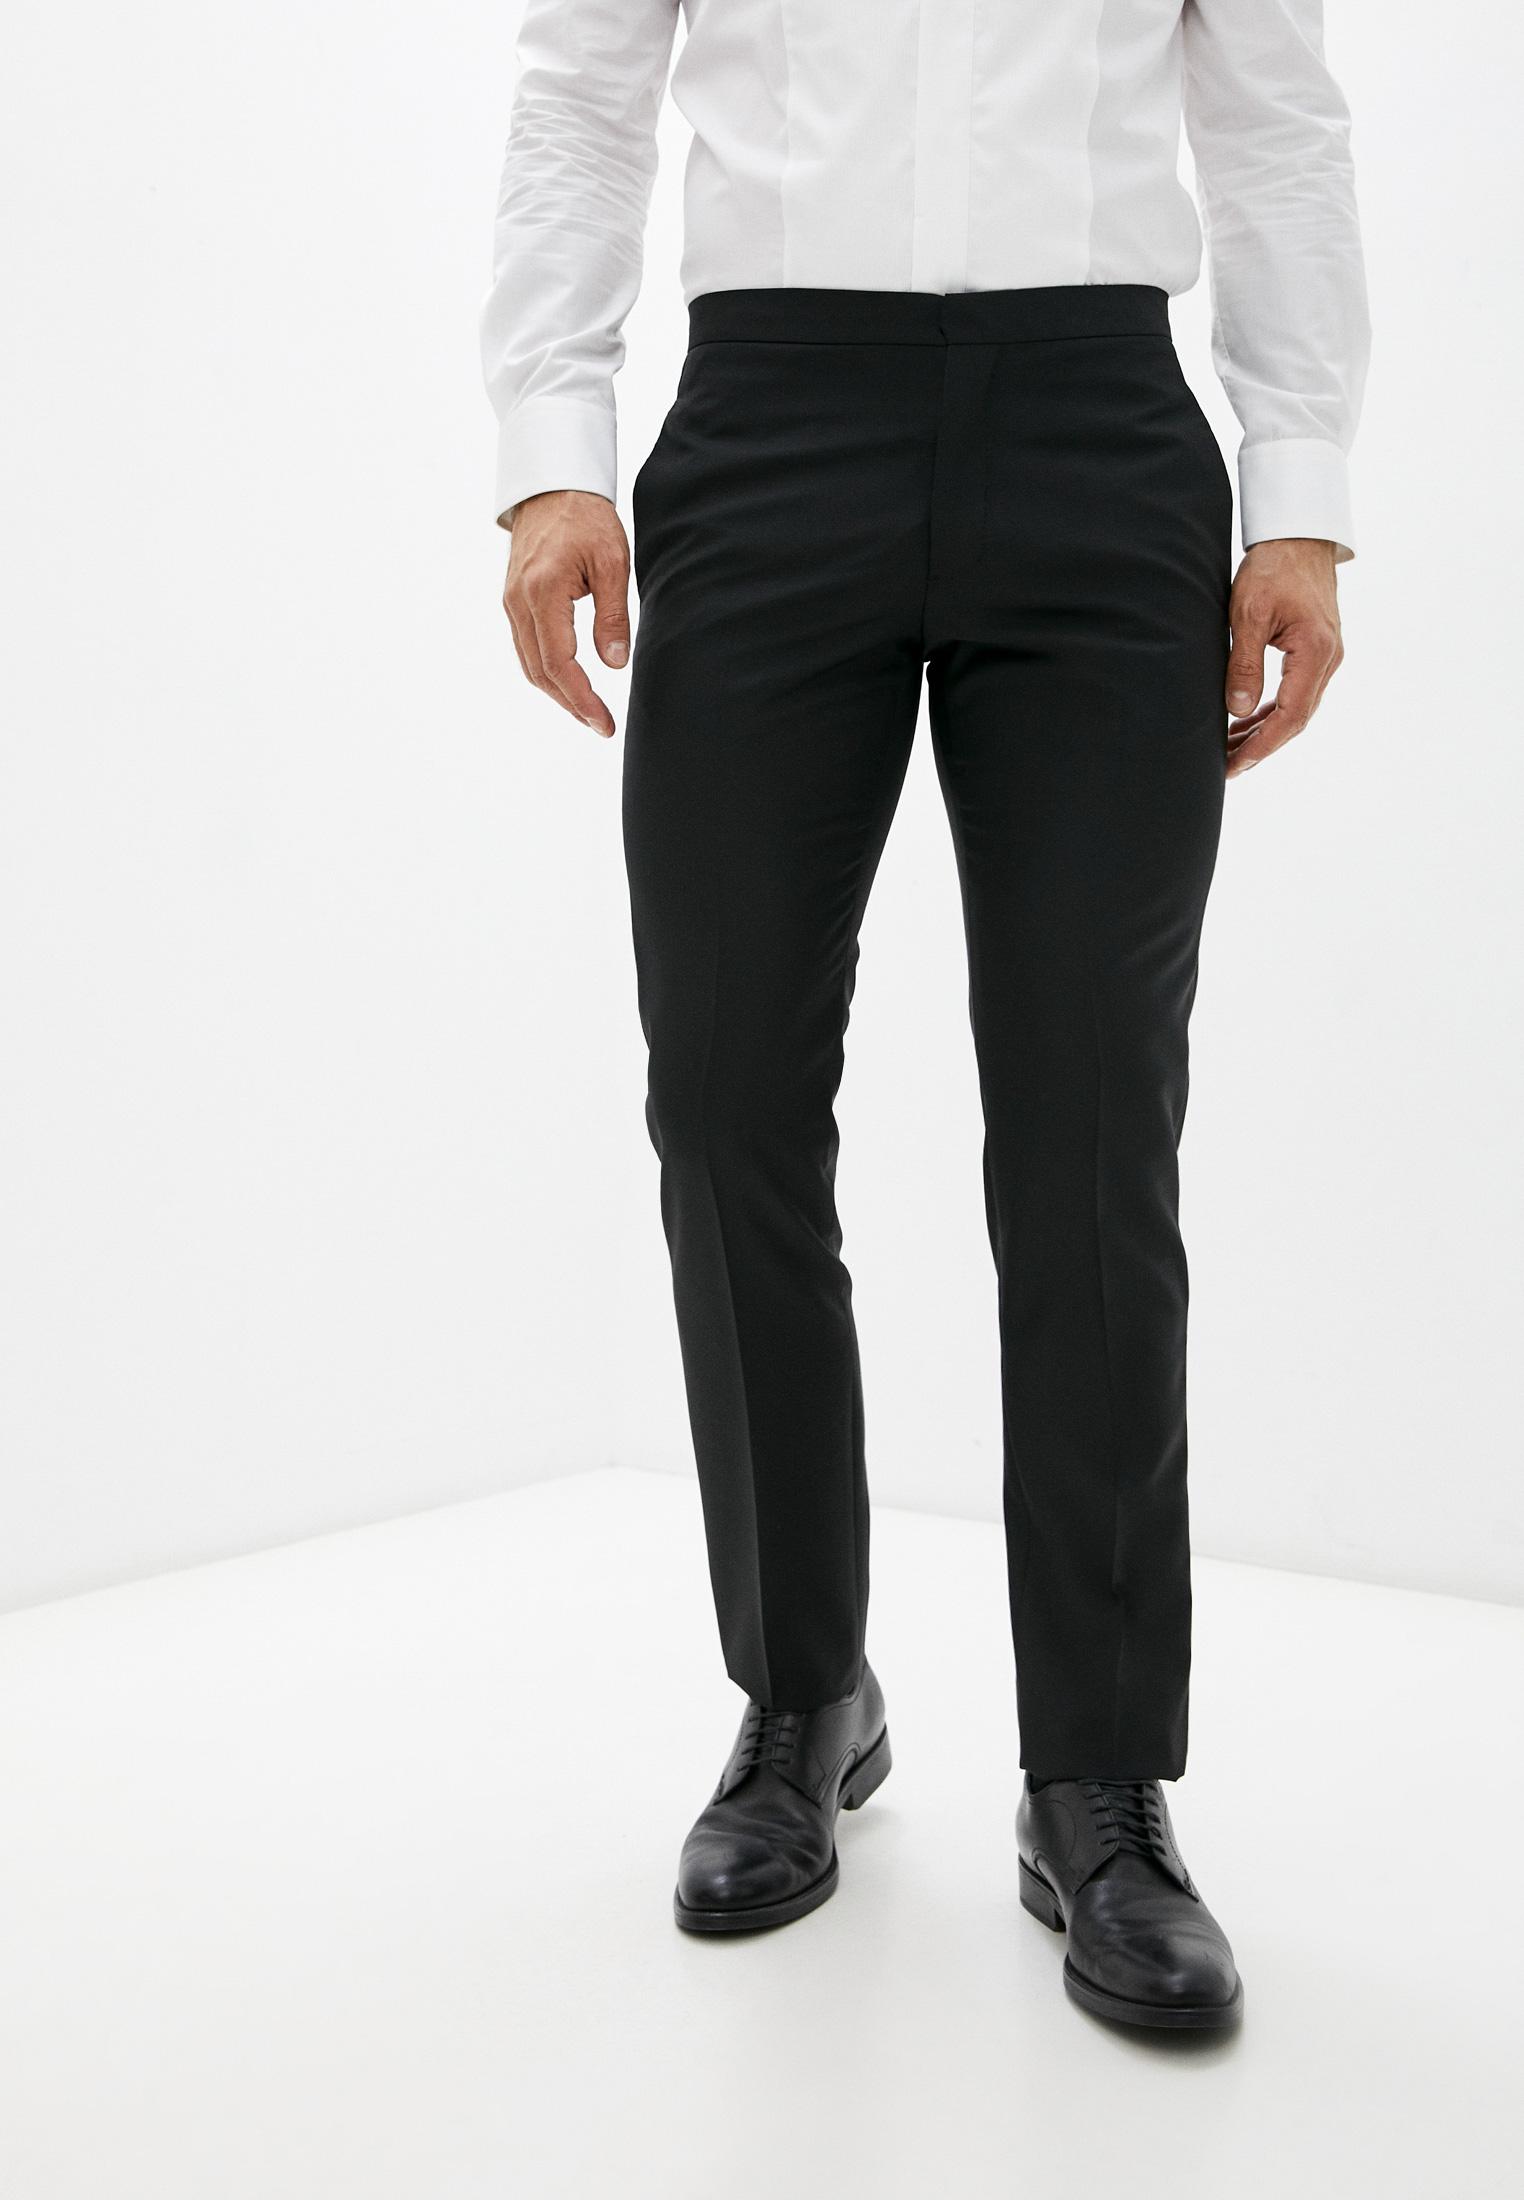 Мужские классические брюки Emporio Armani (Эмпорио Армани) W1P4DK 01500